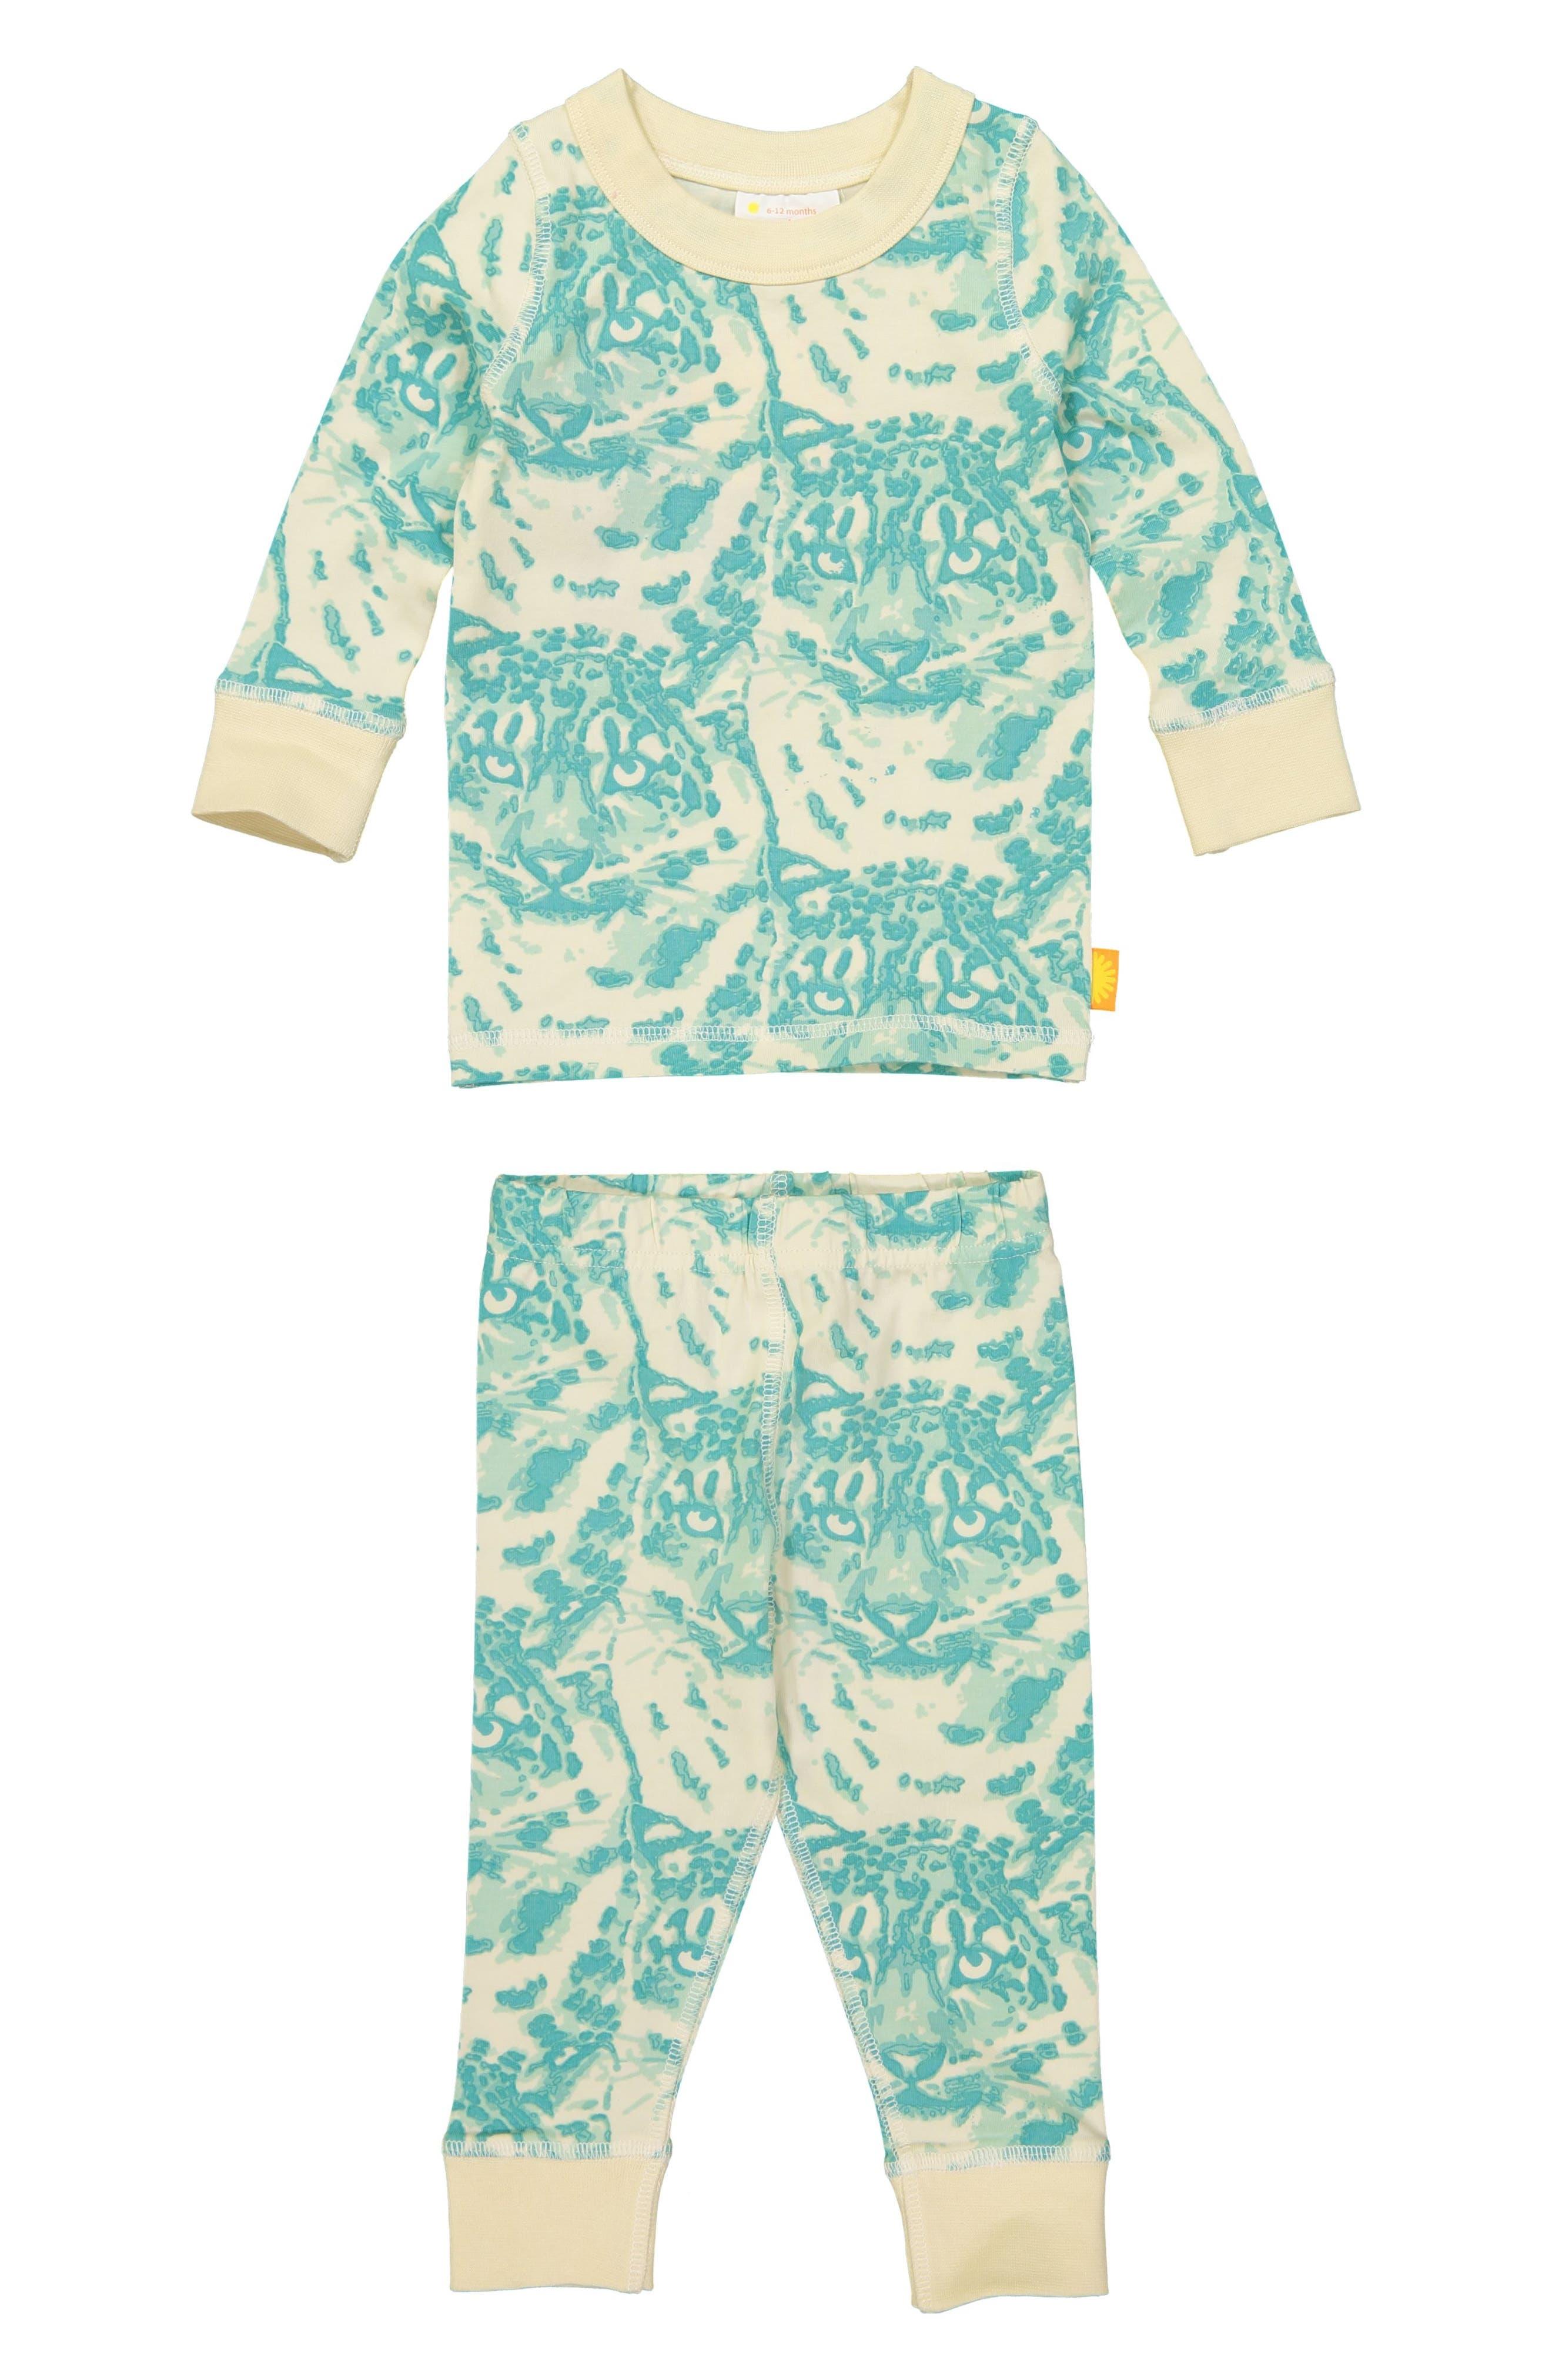 Cat Camo Organic Cotton Fitted Two-Piece Pajamas,                             Main thumbnail 1, color,                             AQUA